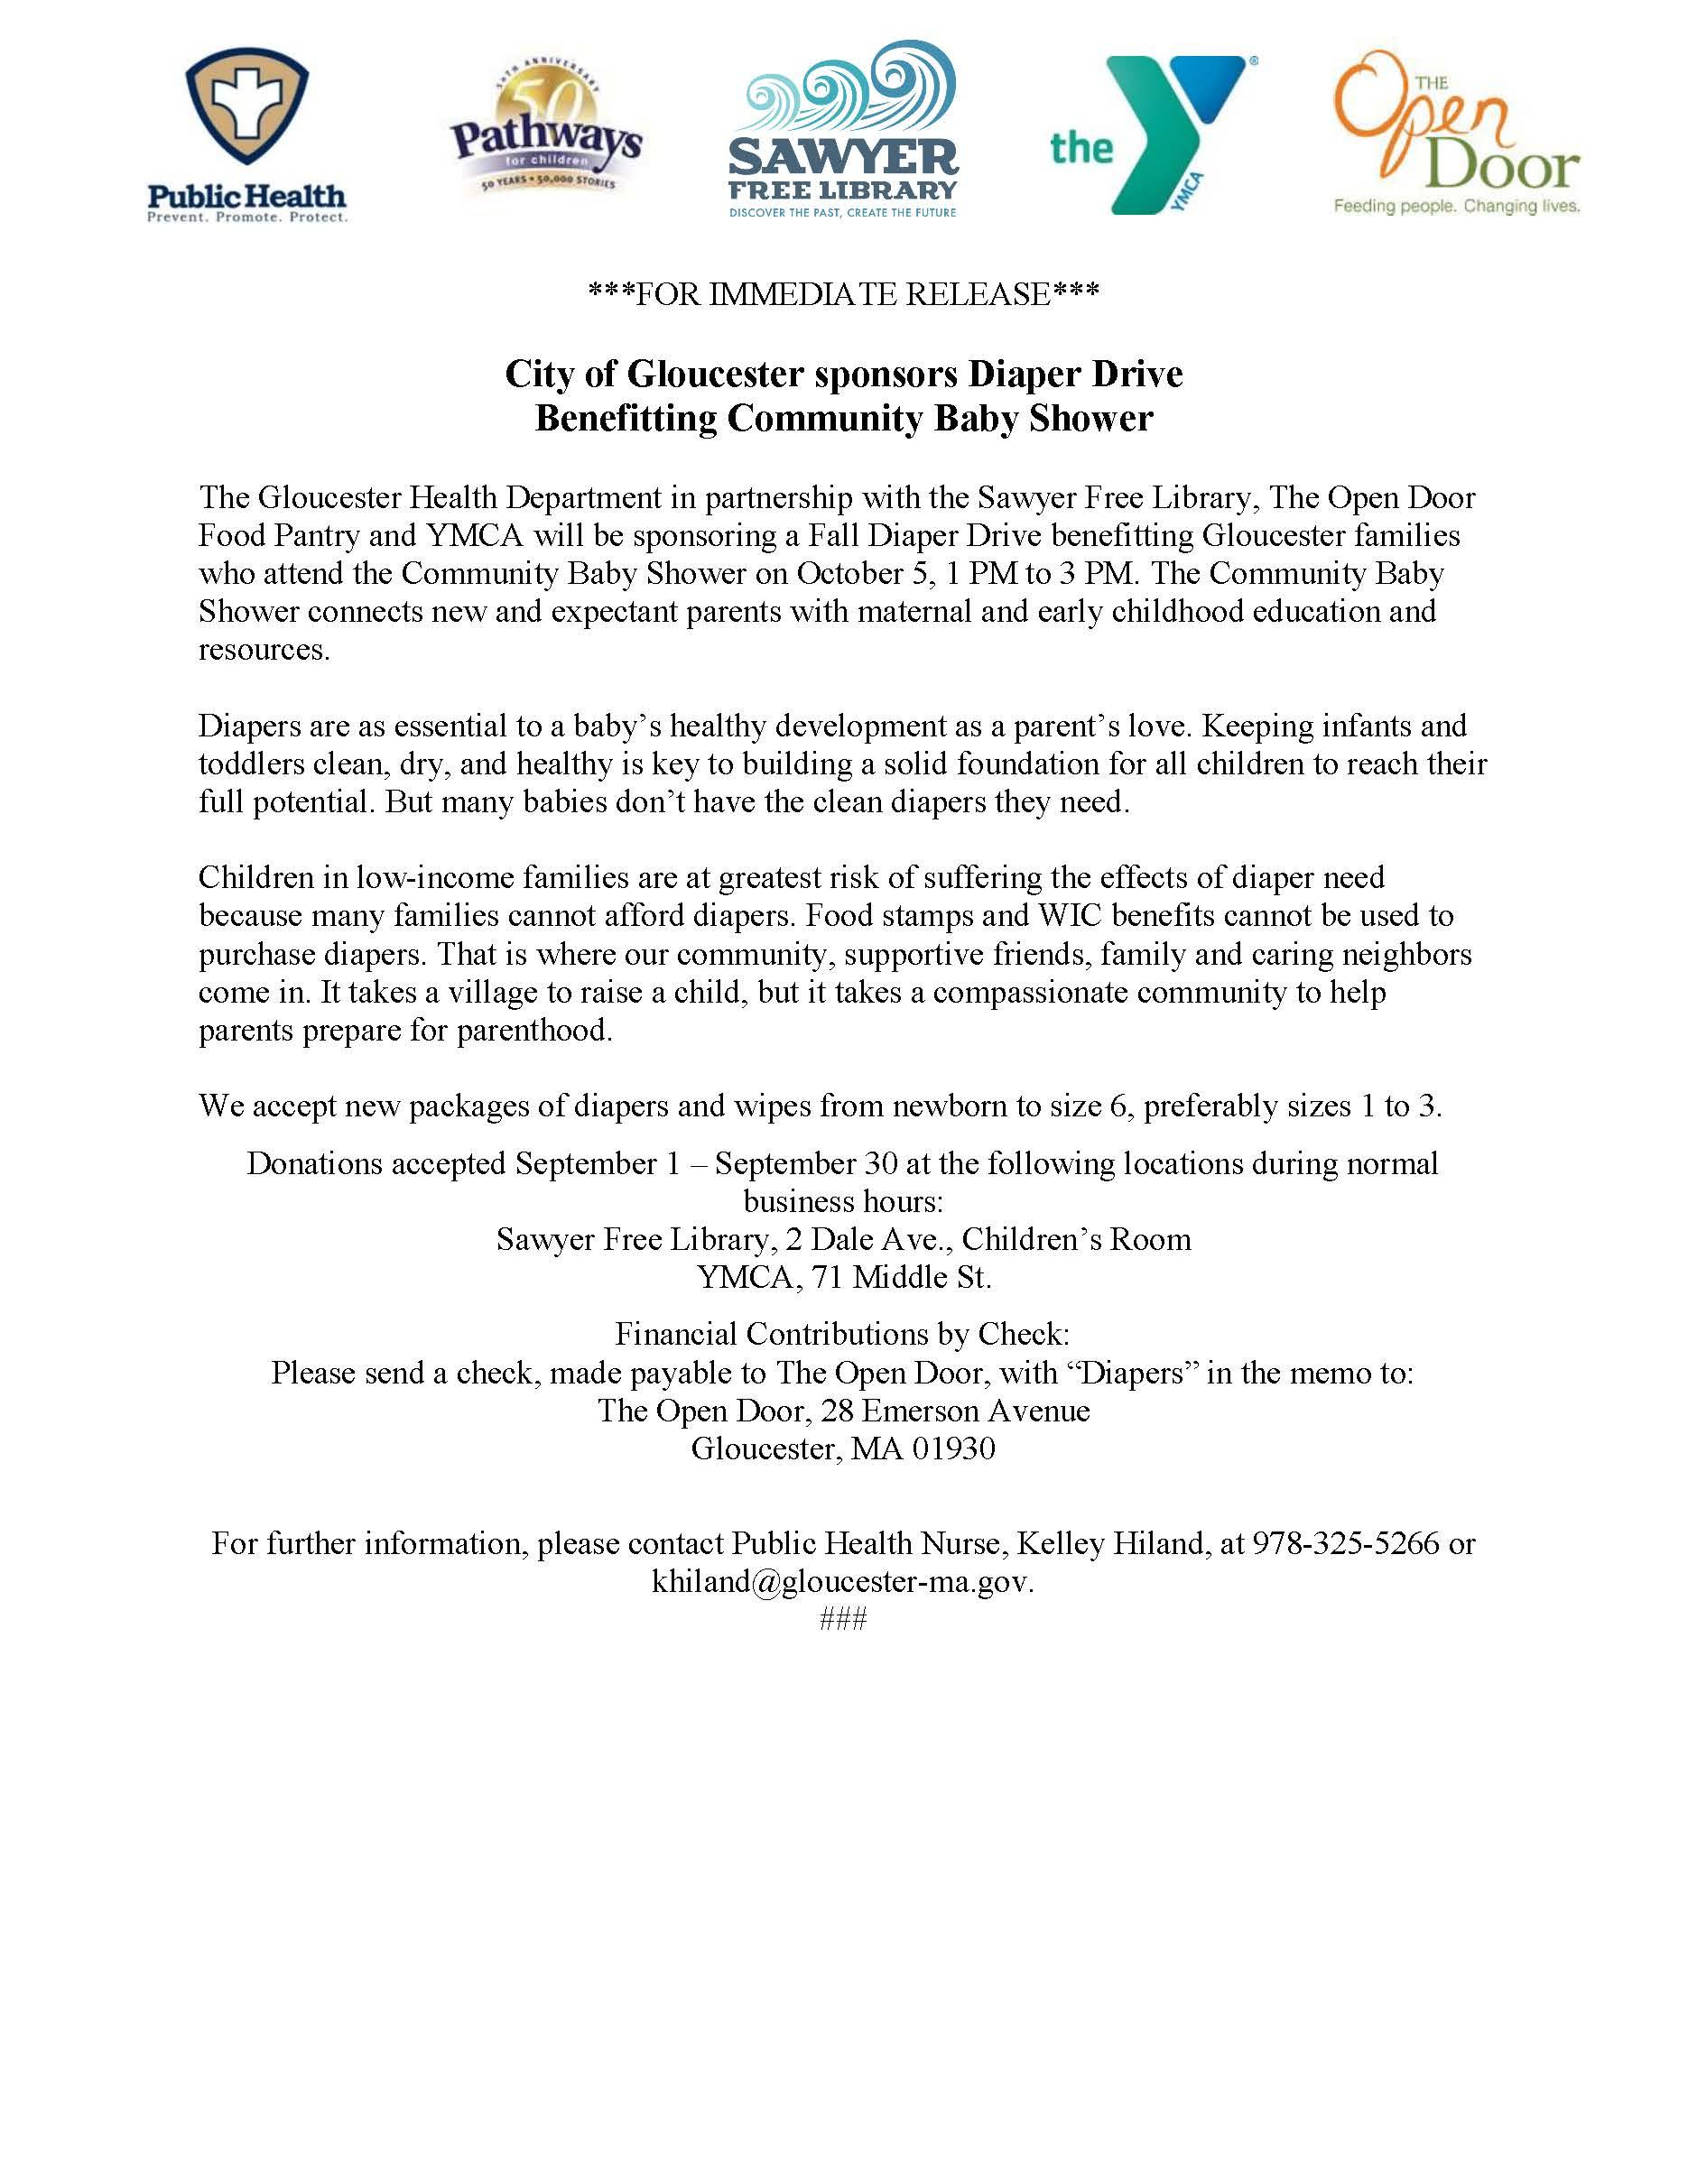 Diaper Drive Press Release